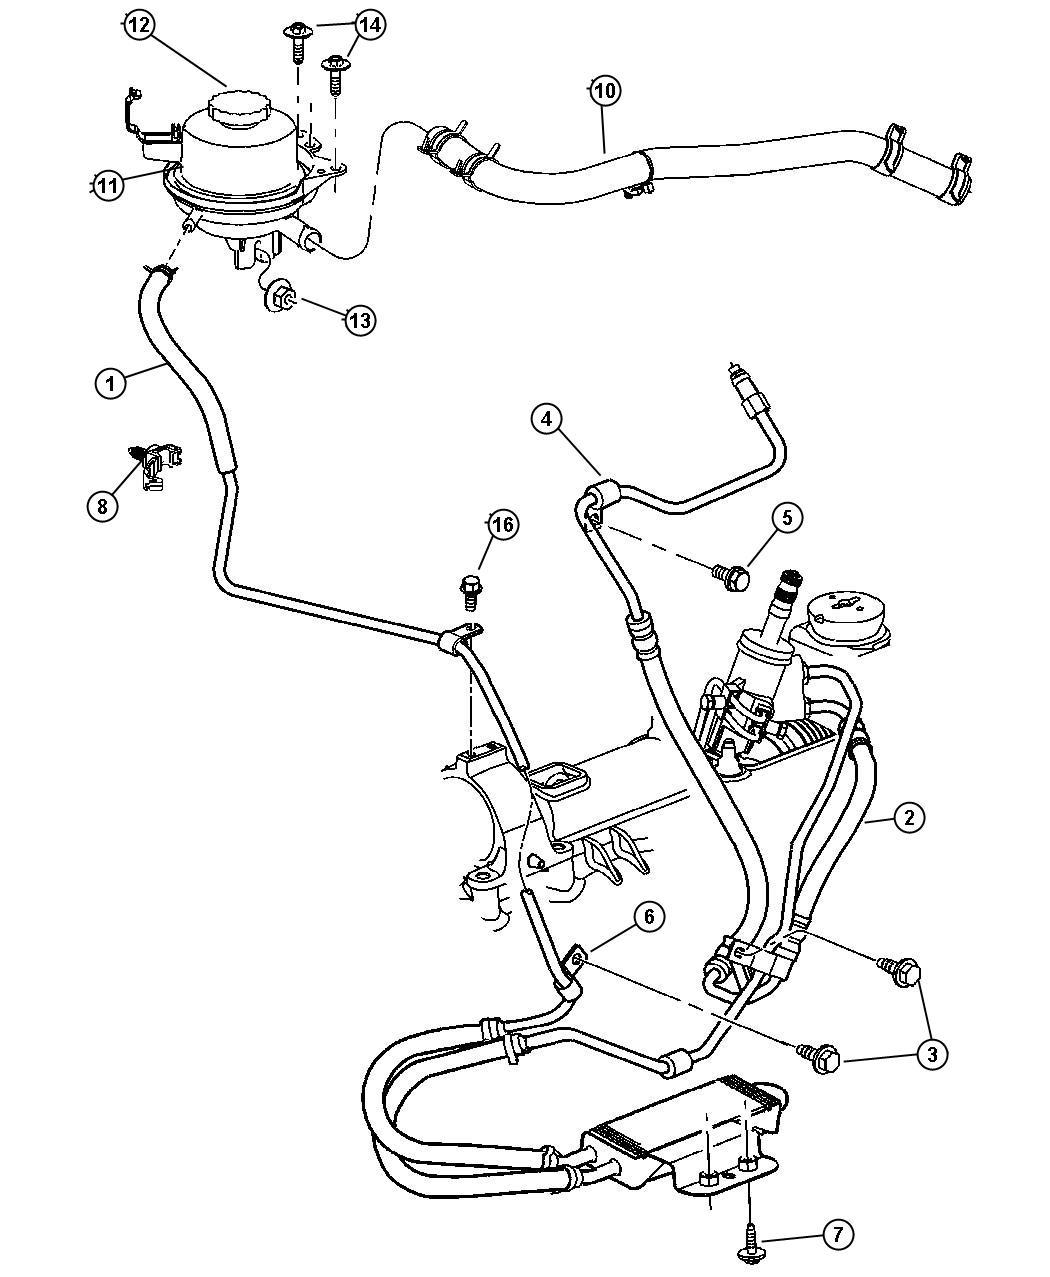 2006 Dodge Grand Caravan Reservoir  Power Steering Fluid